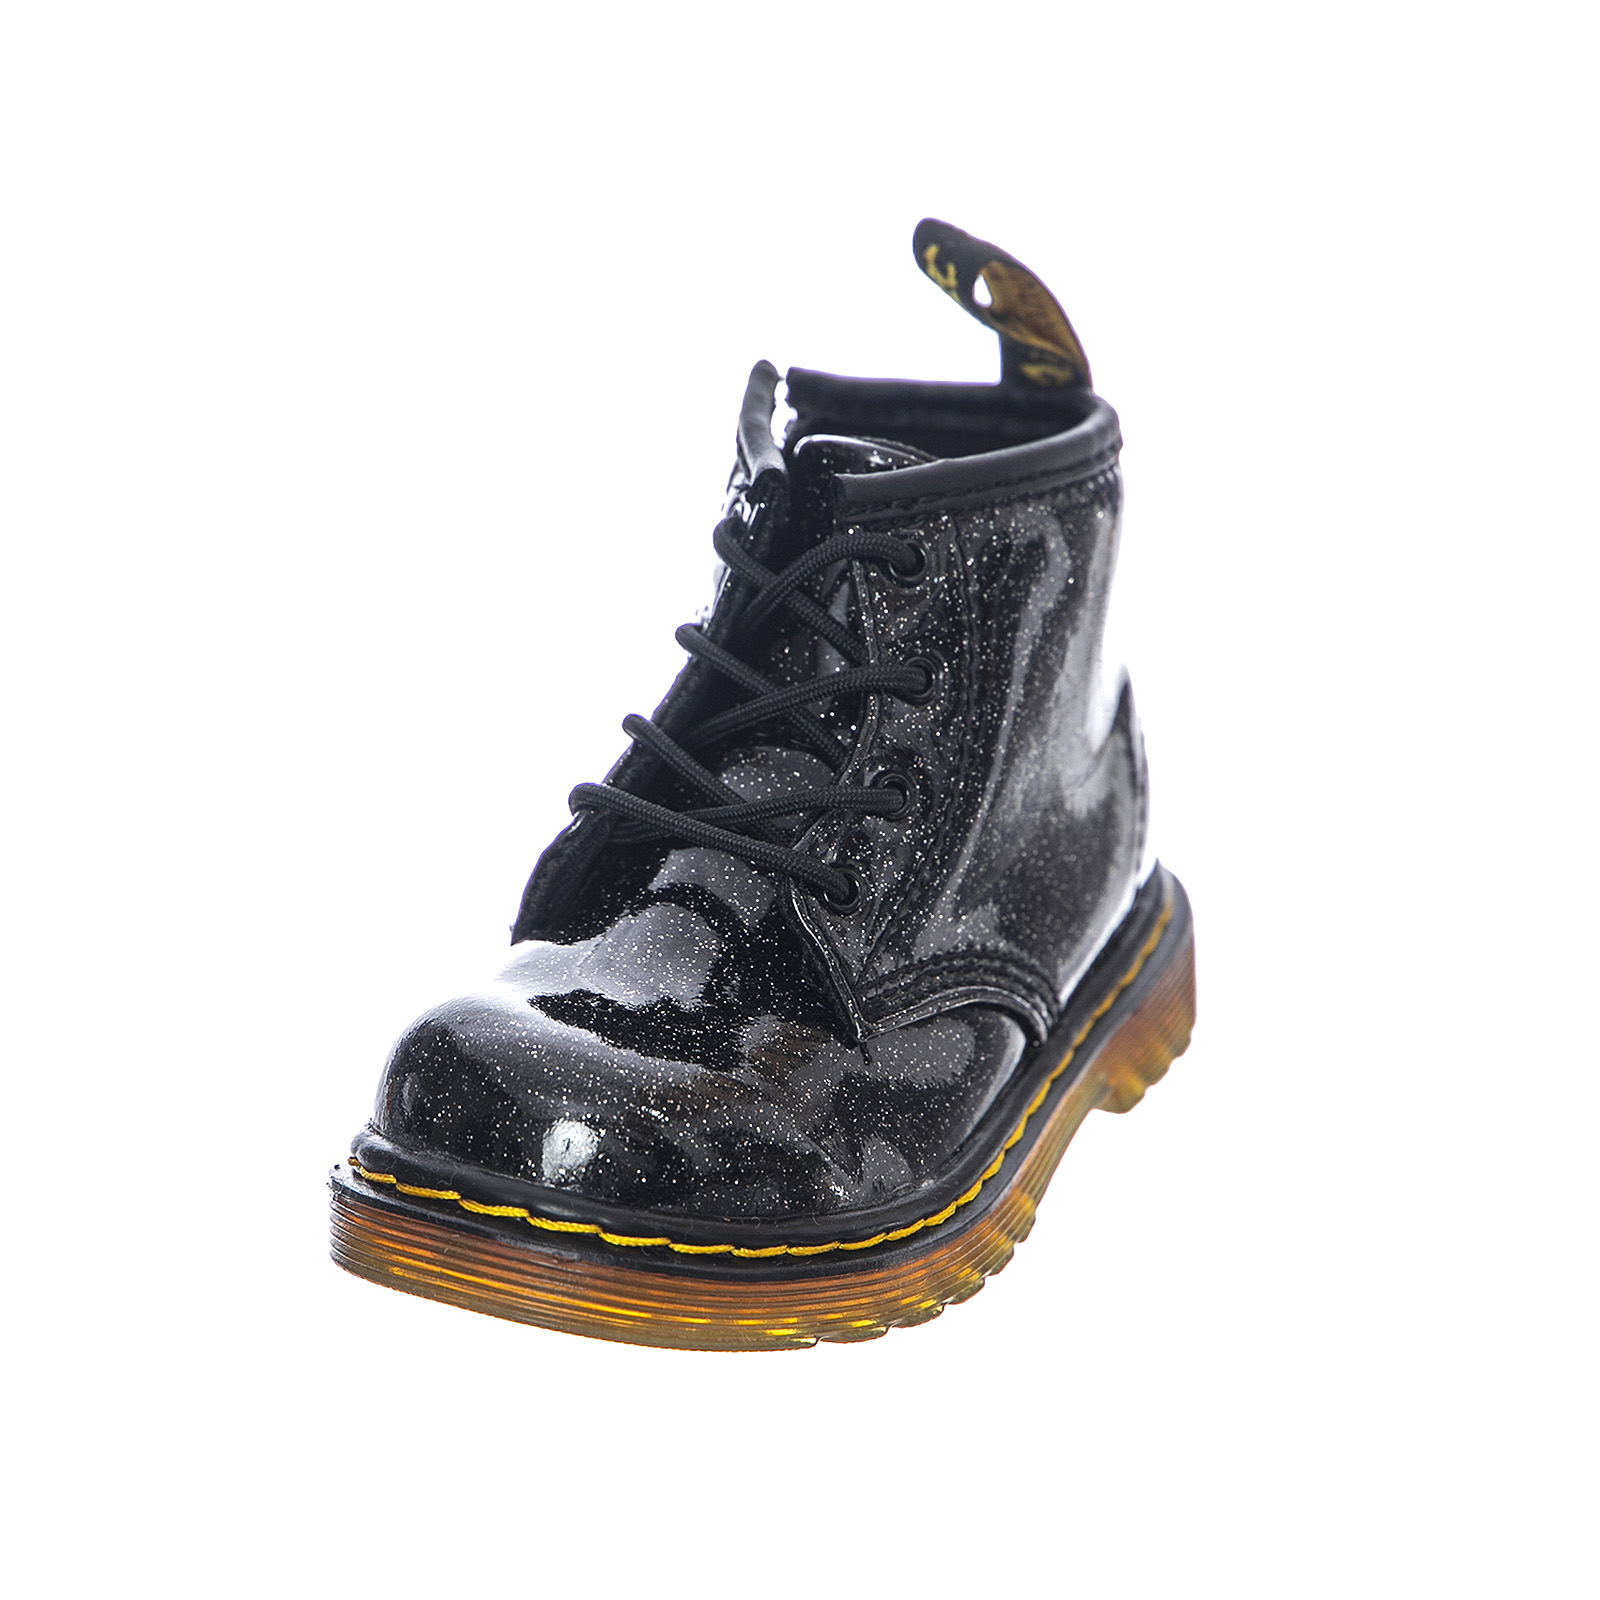 vino restare profumo  Dr.martens 1460 glitter infant boots - stivali bambino glitter neri -  neonato   eBay